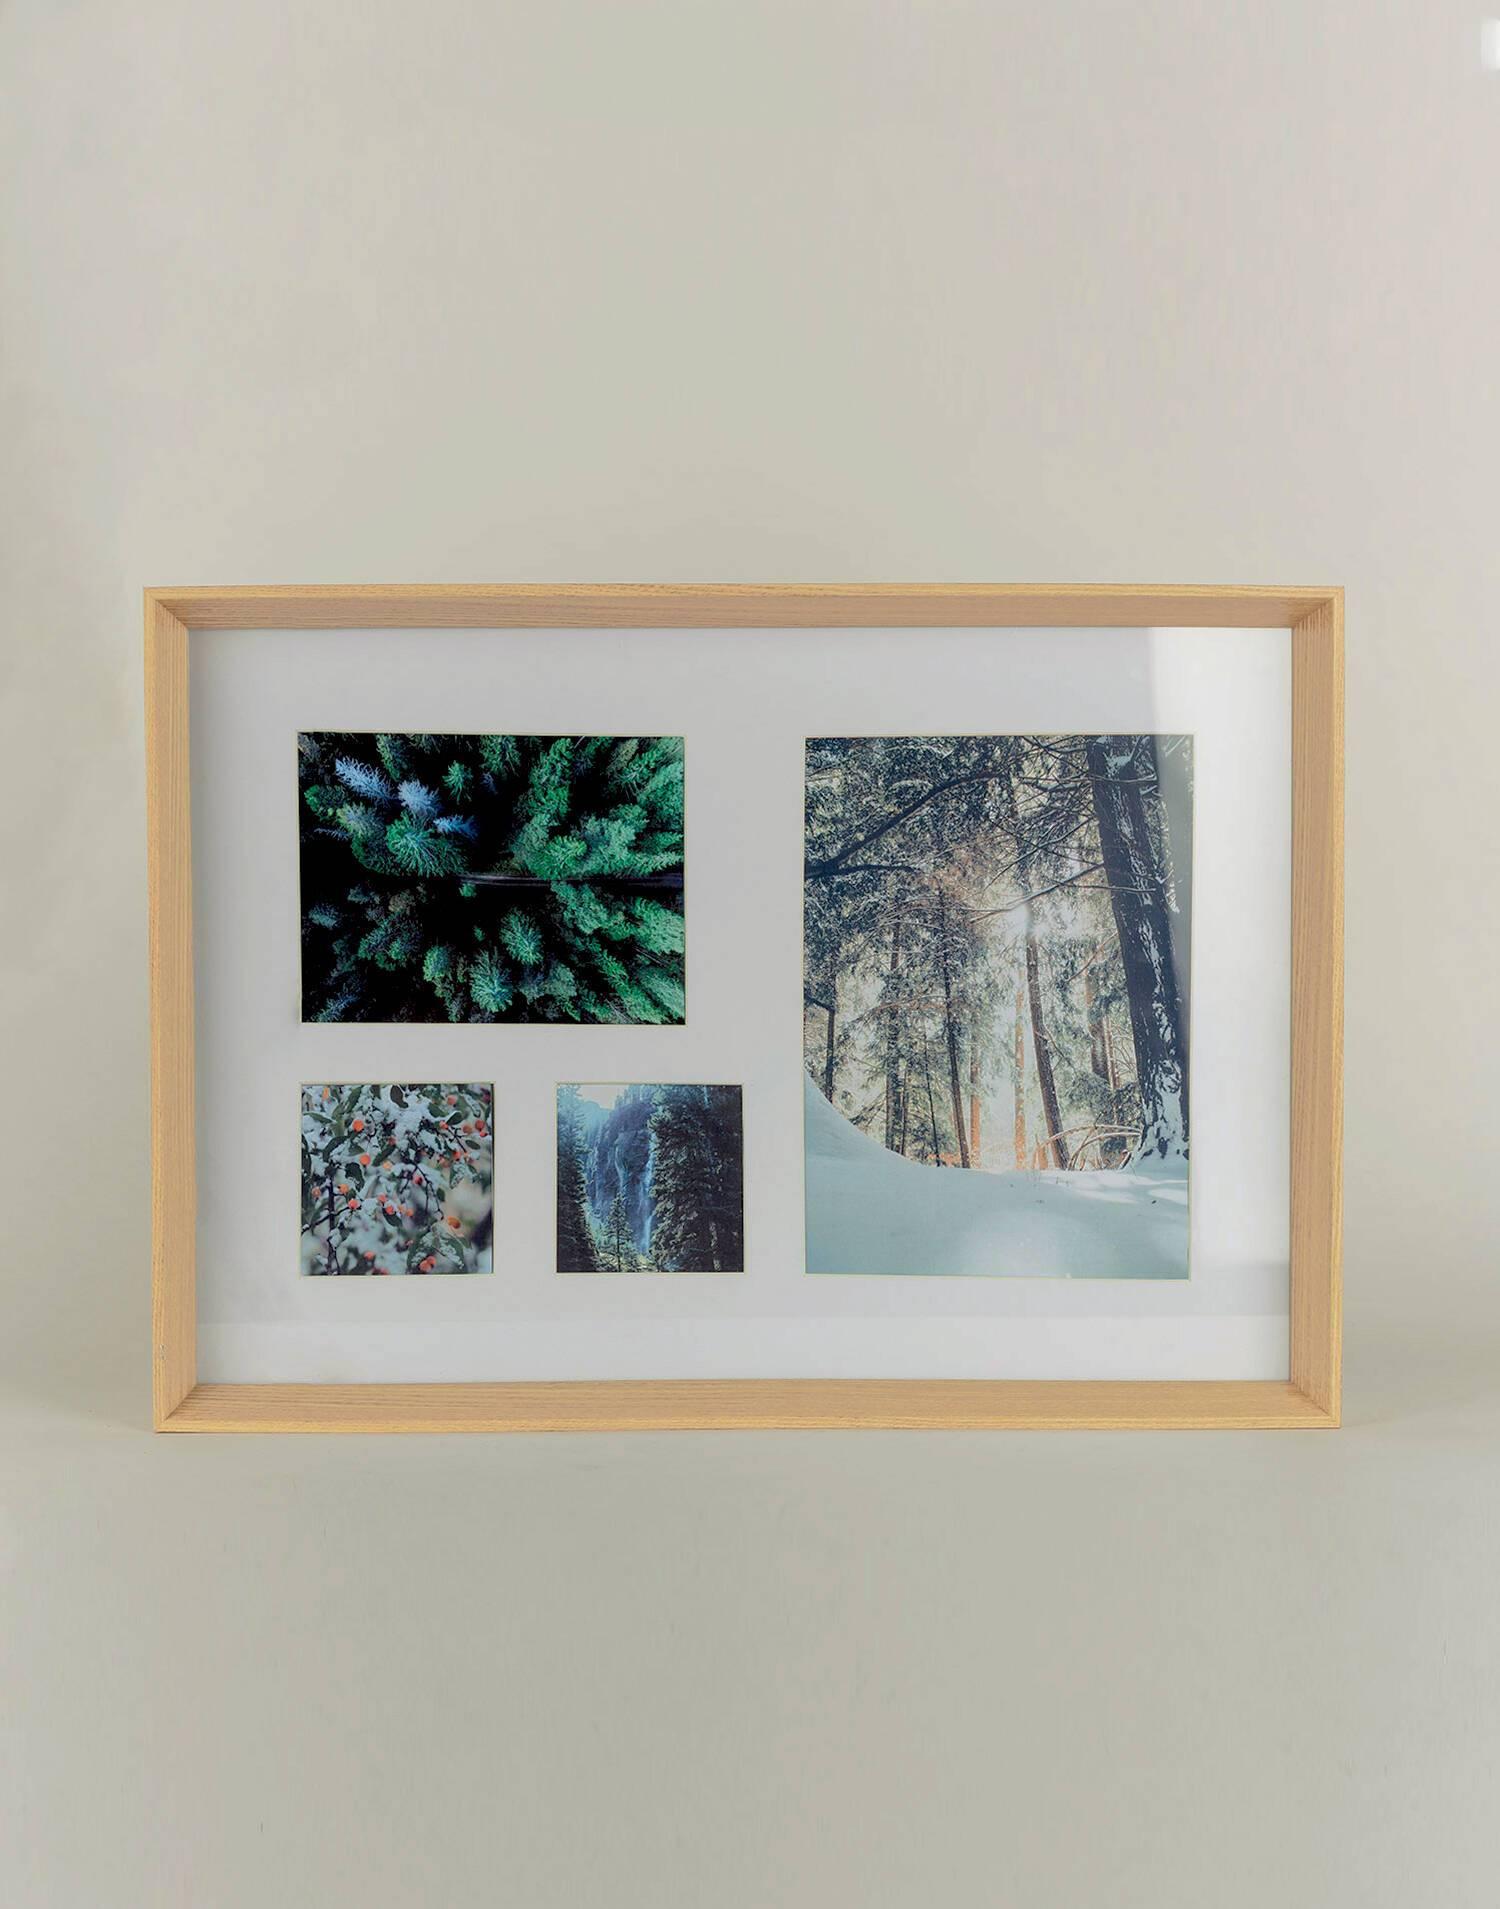 4 photo frame